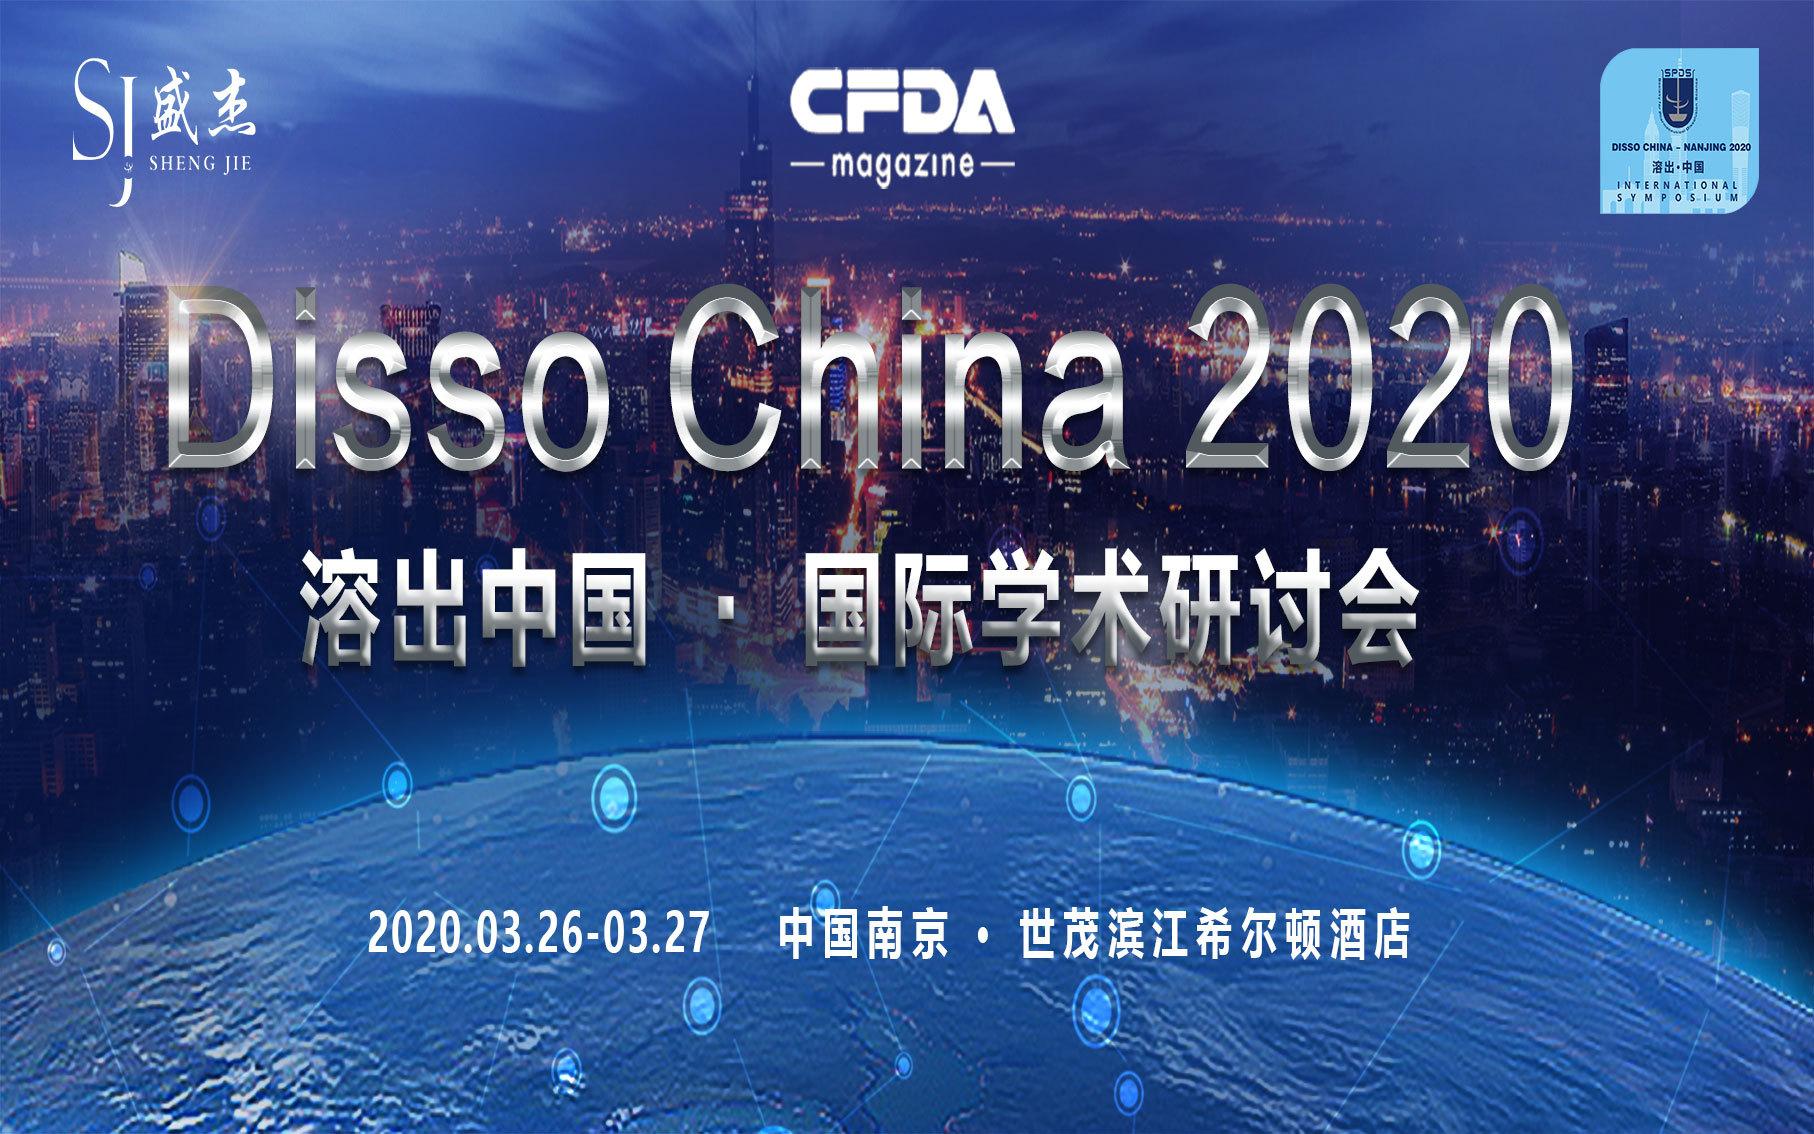 Disso China 2020 国际学术研讨会(南京)